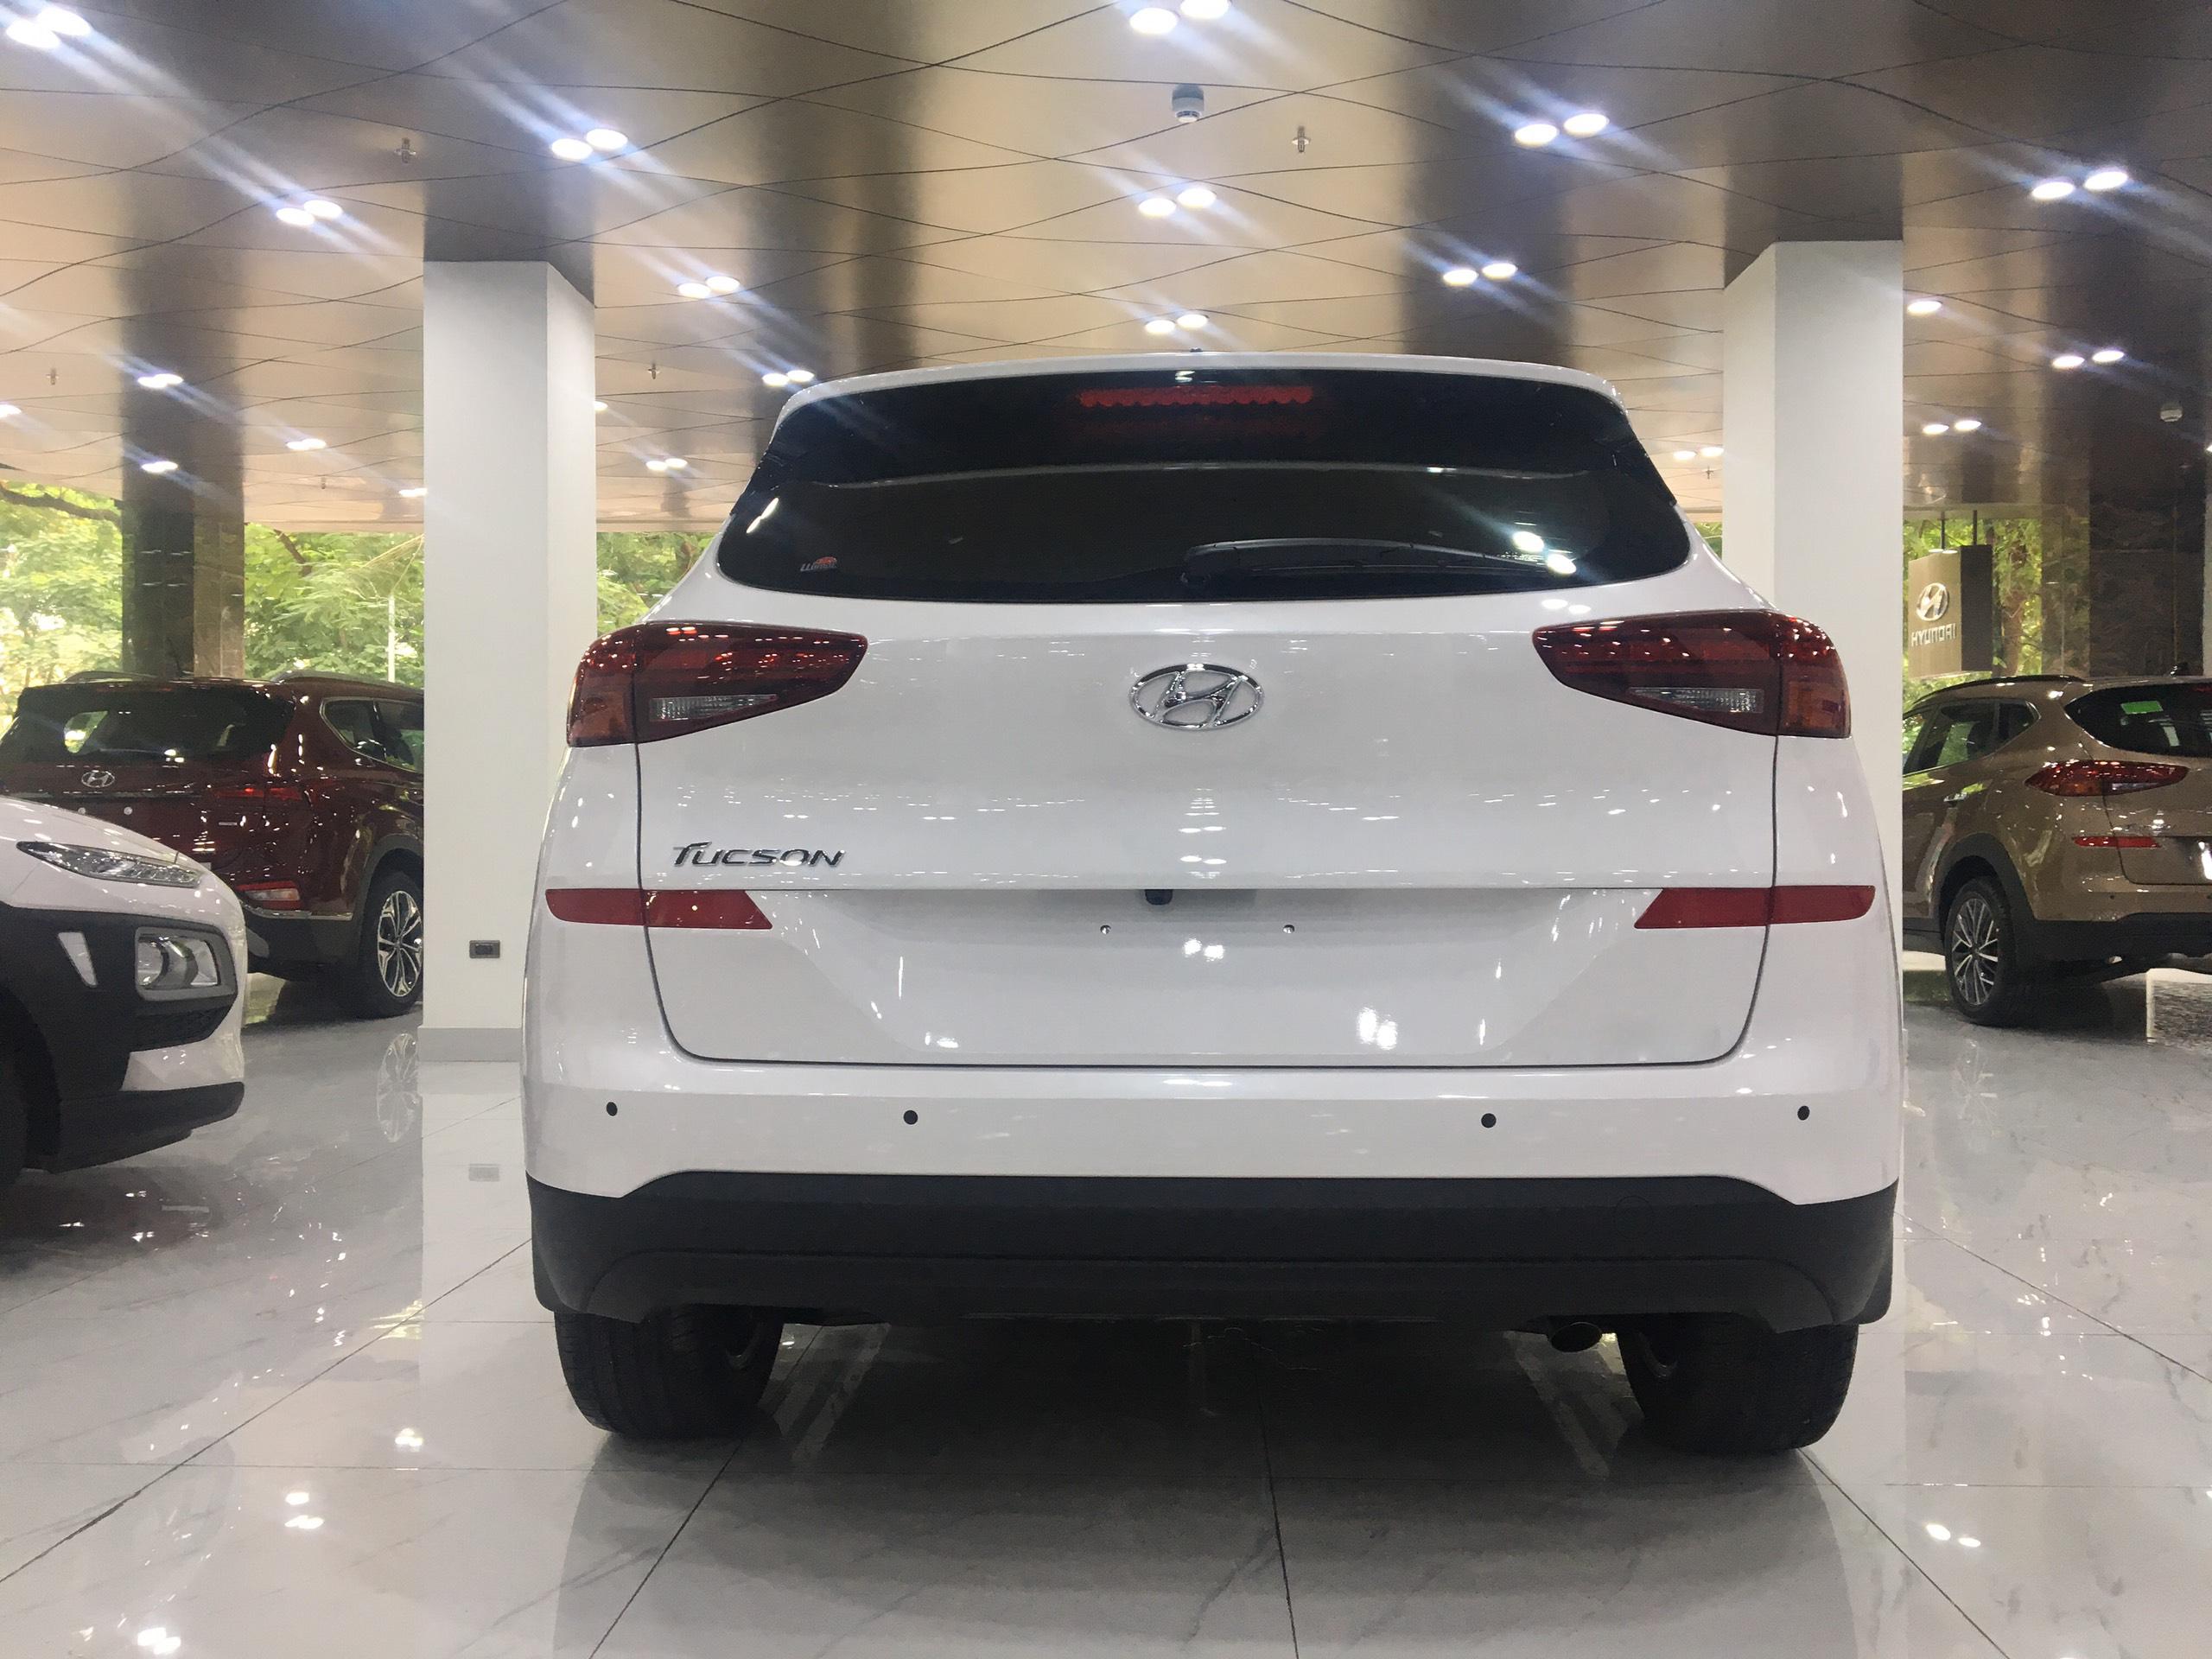 Hyundai Tucson 2.0 AT Đặc biệt 2019 (4)